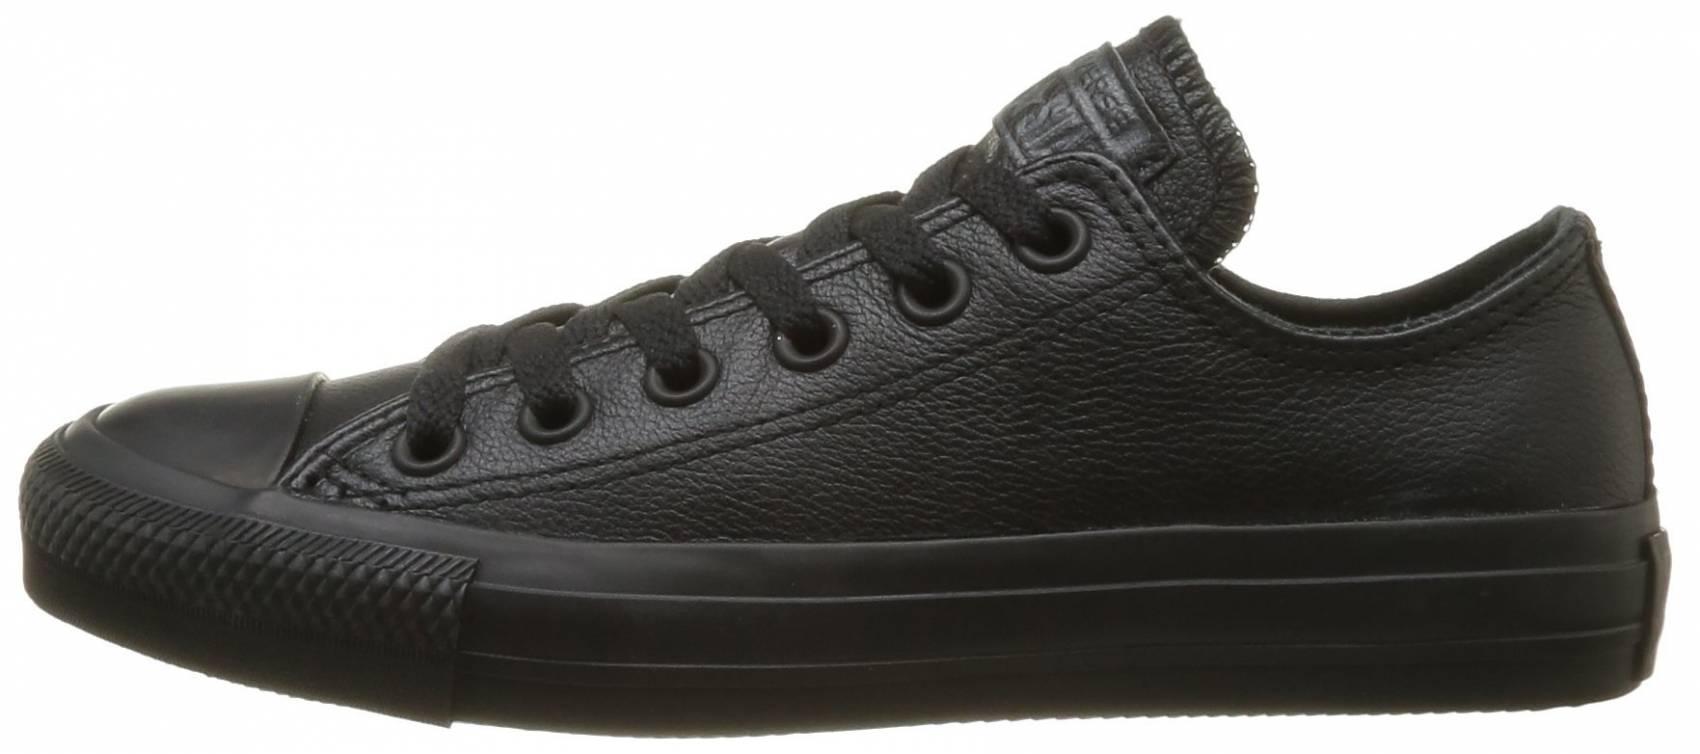 60 Converse sneakers - Save 30% | RunRepeat